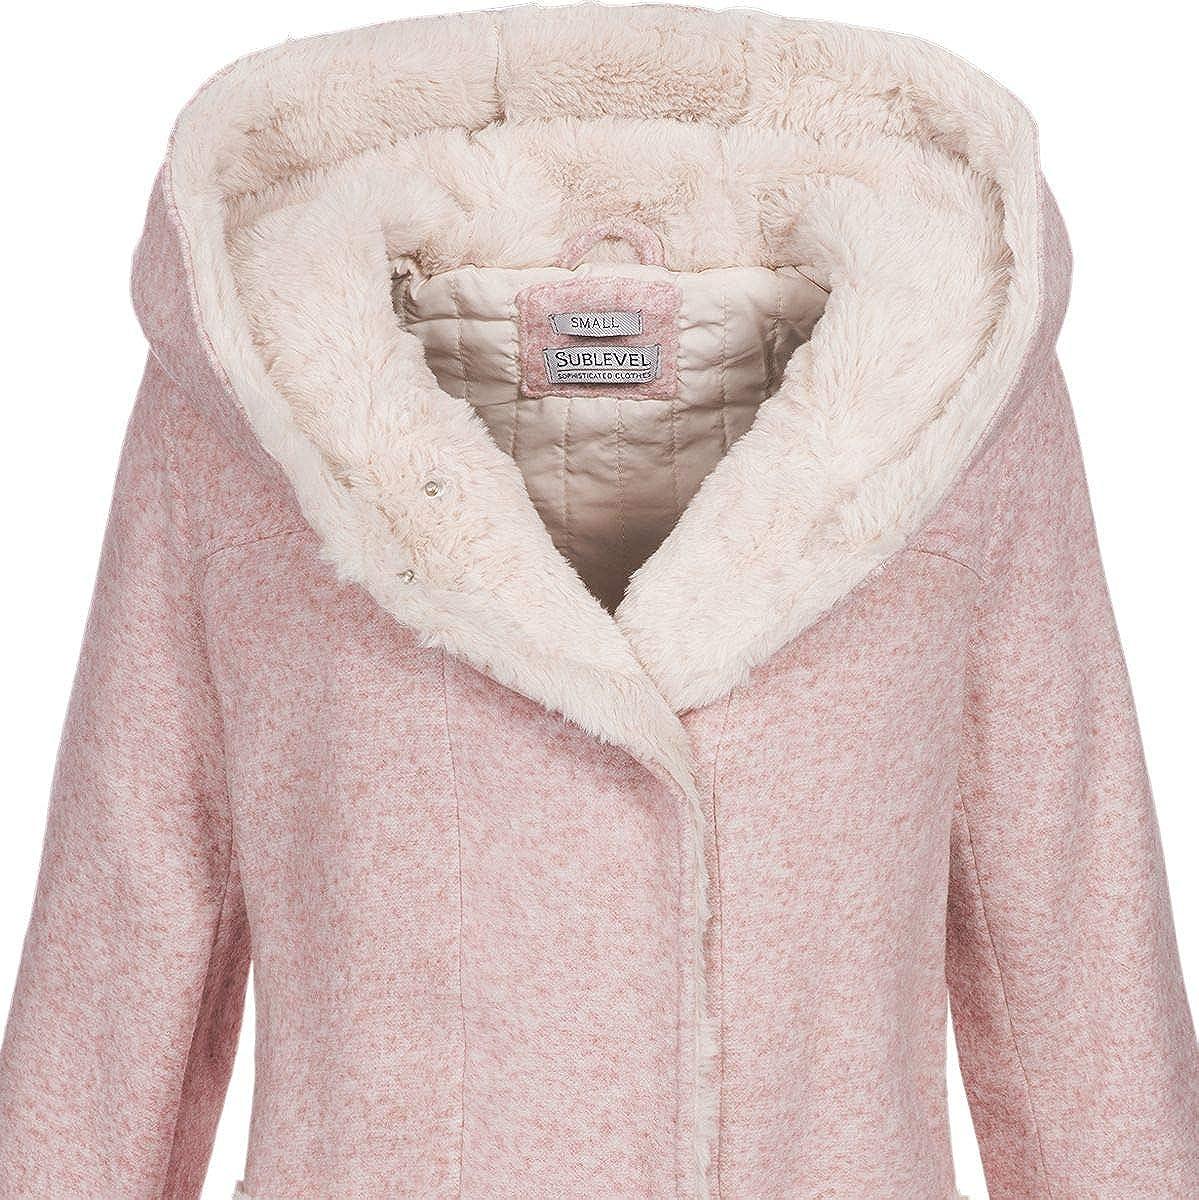 Sublevel Damen Woll-Mantel Jacke LSL-298//352 Kapuze meliert